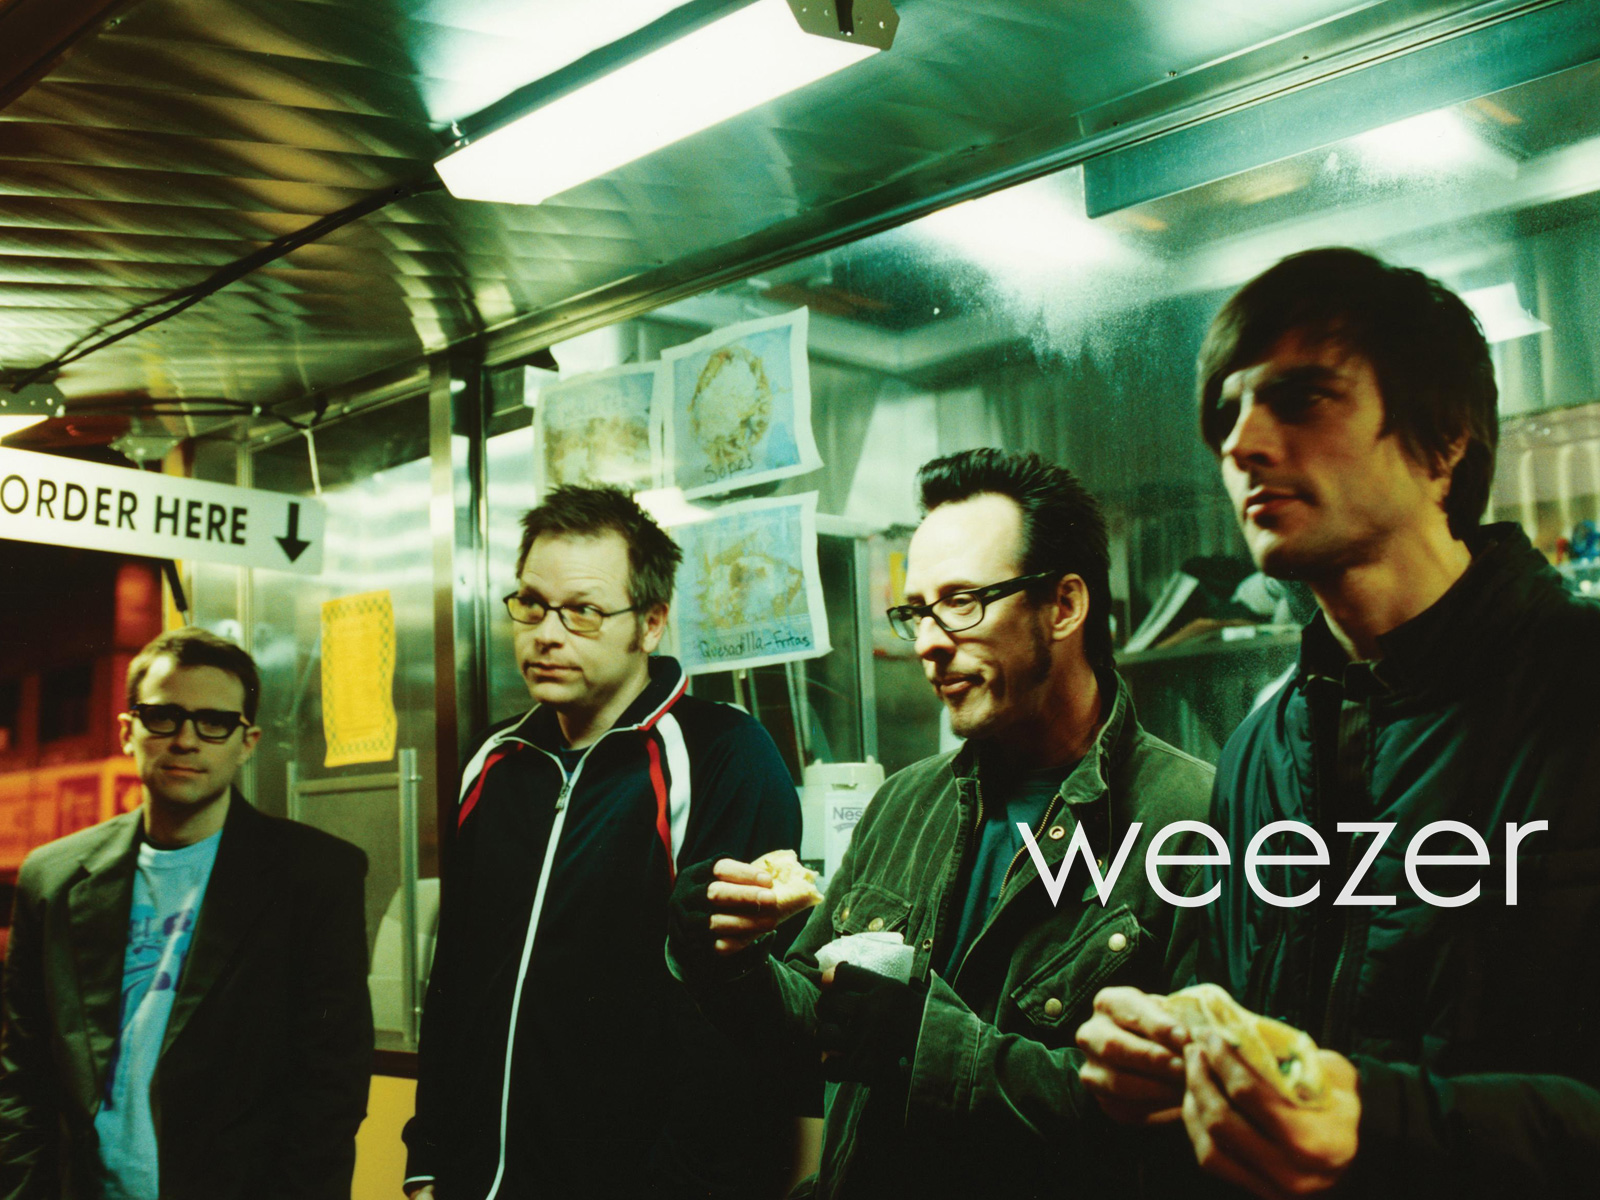 http://1.bp.blogspot.com/-EF6l-GDnoEI/UOLwDv4hUPI/AAAAAAAAWXY/k_sMCVa7rzU/s1600/weezer.jpg